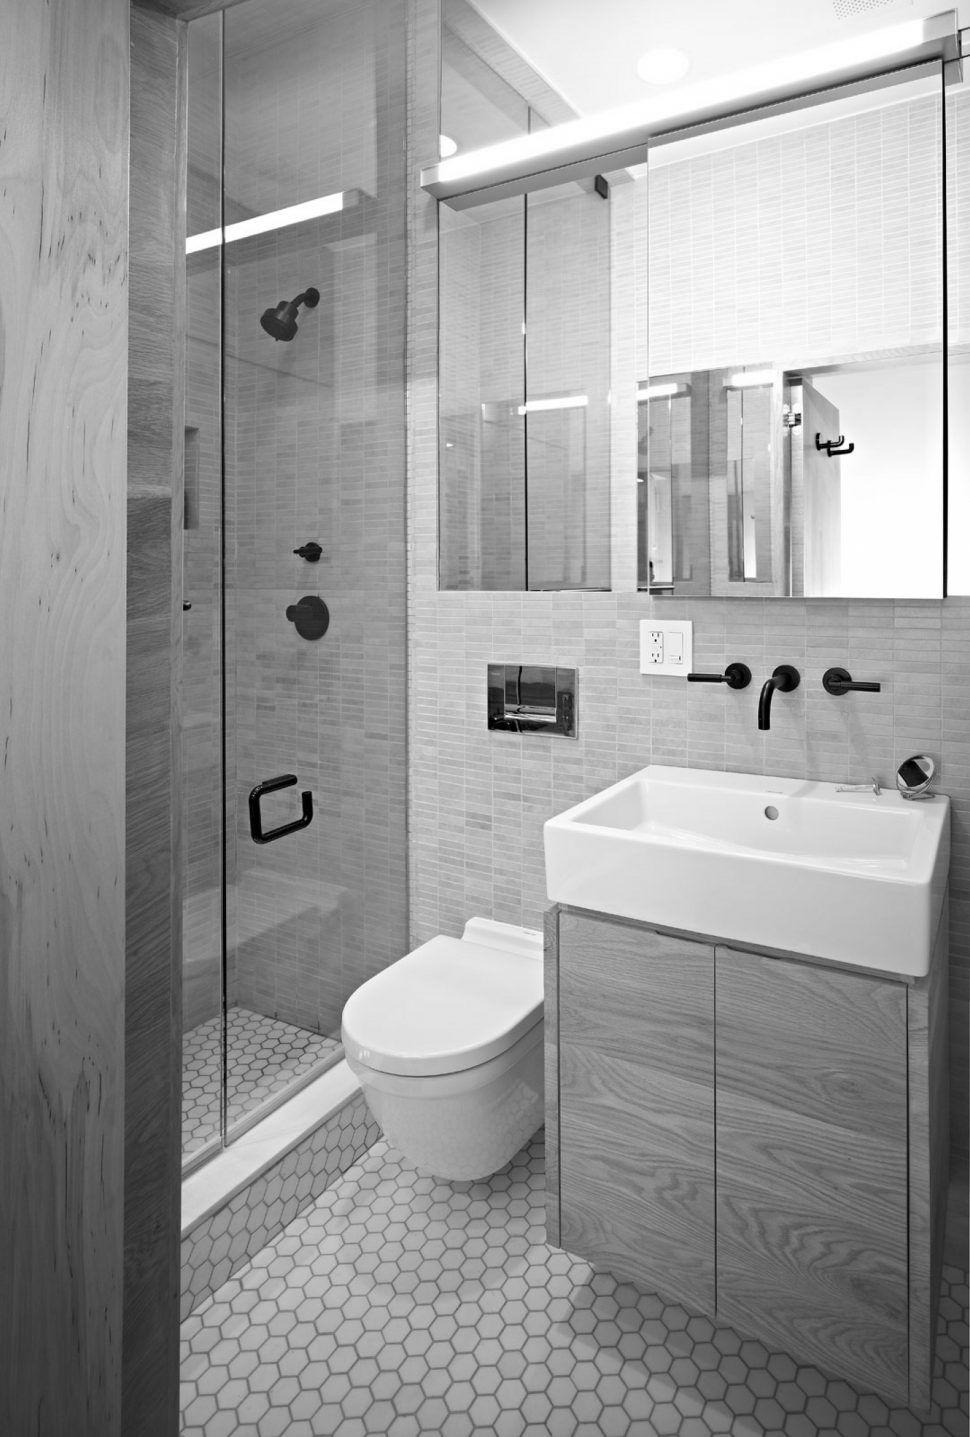 Bathroom Small Image By Calikidd Calikidd In 2020 Bathroom